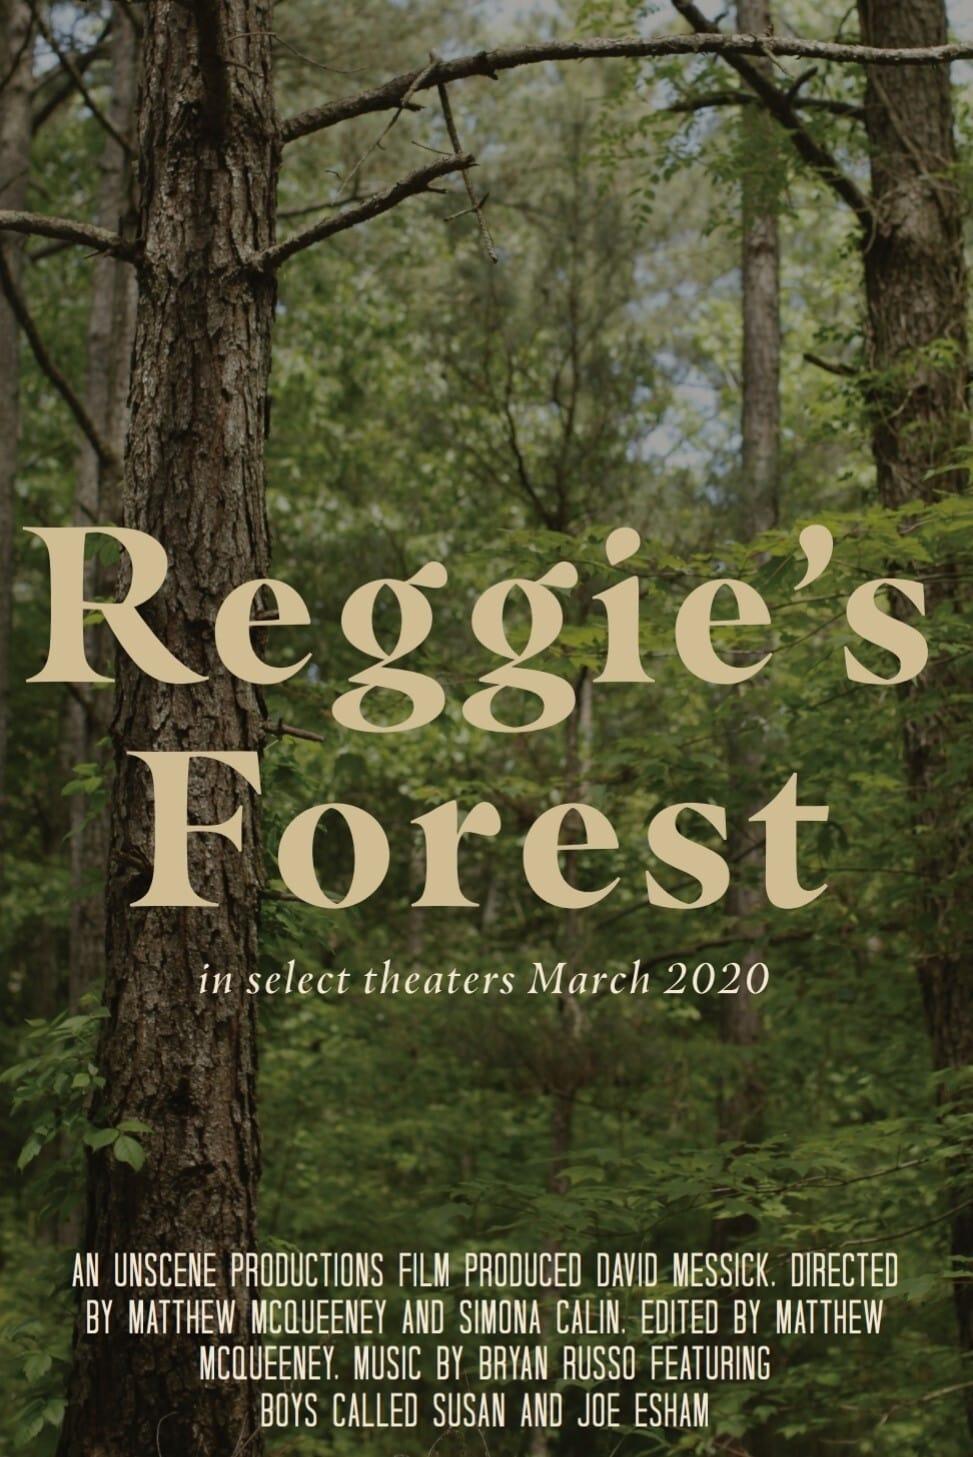 Reggie's Forest